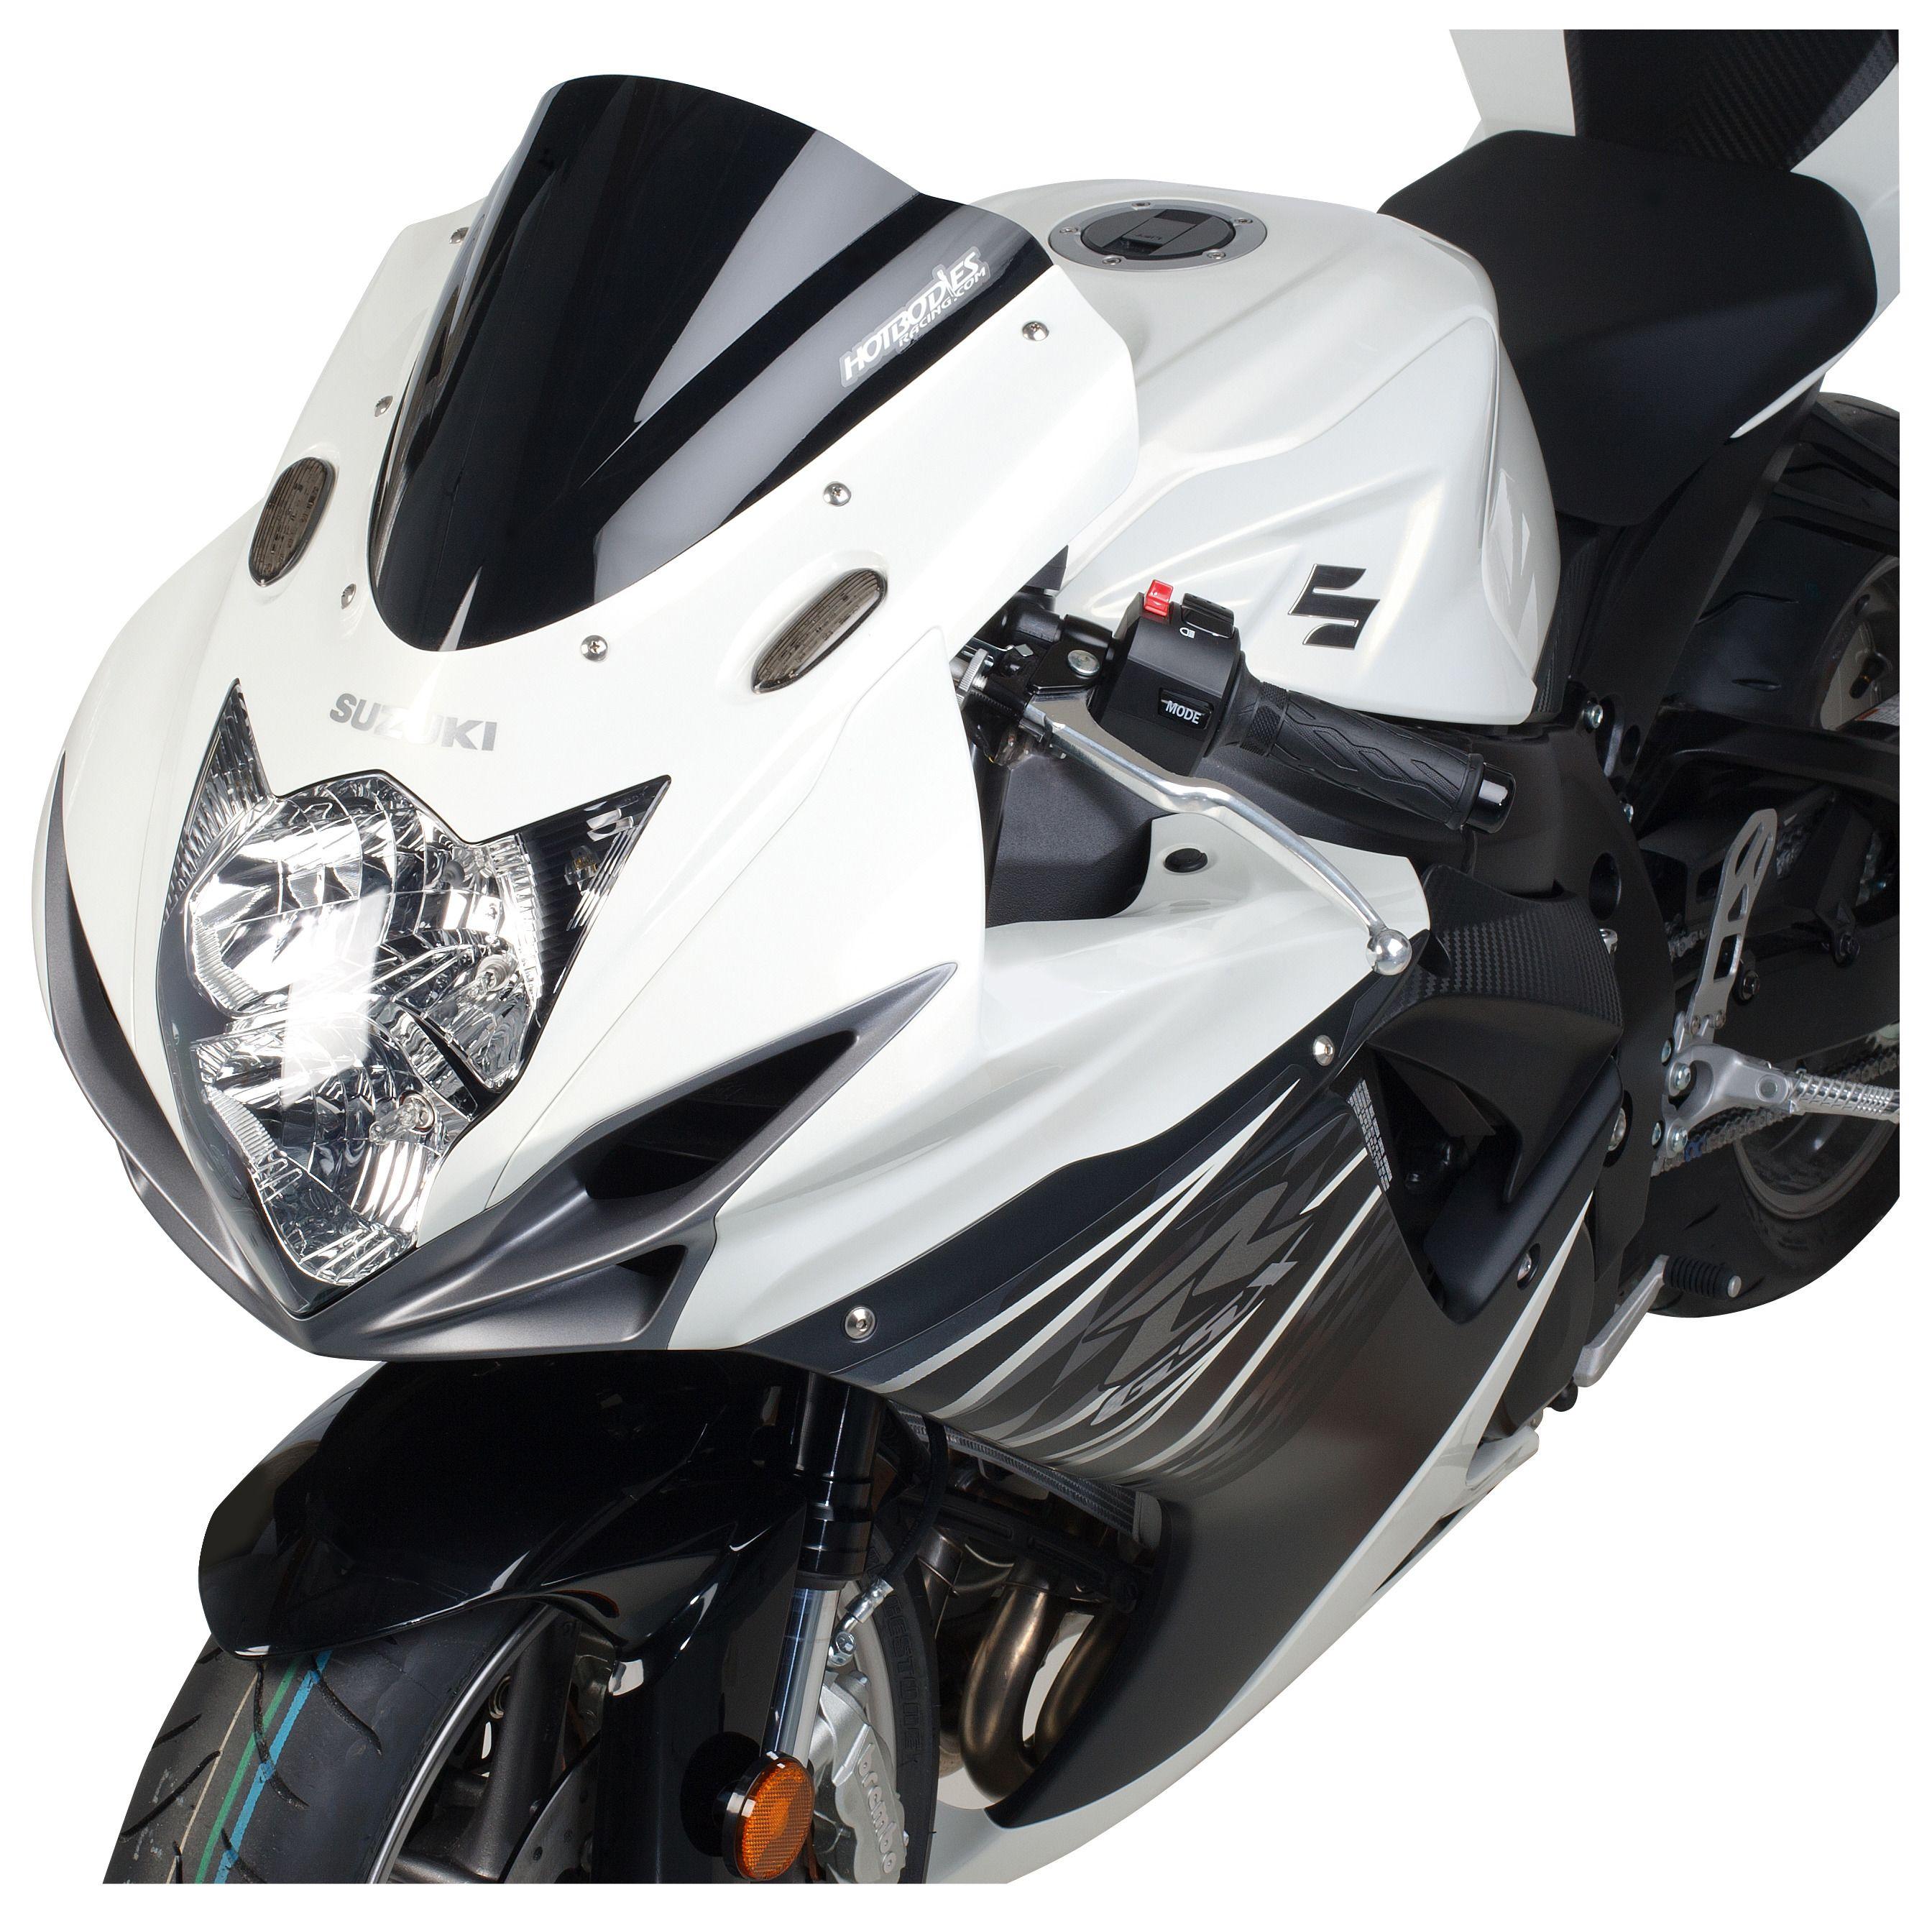 Parts for 2017 Suzuki GSX-R750 - Cycle Gear